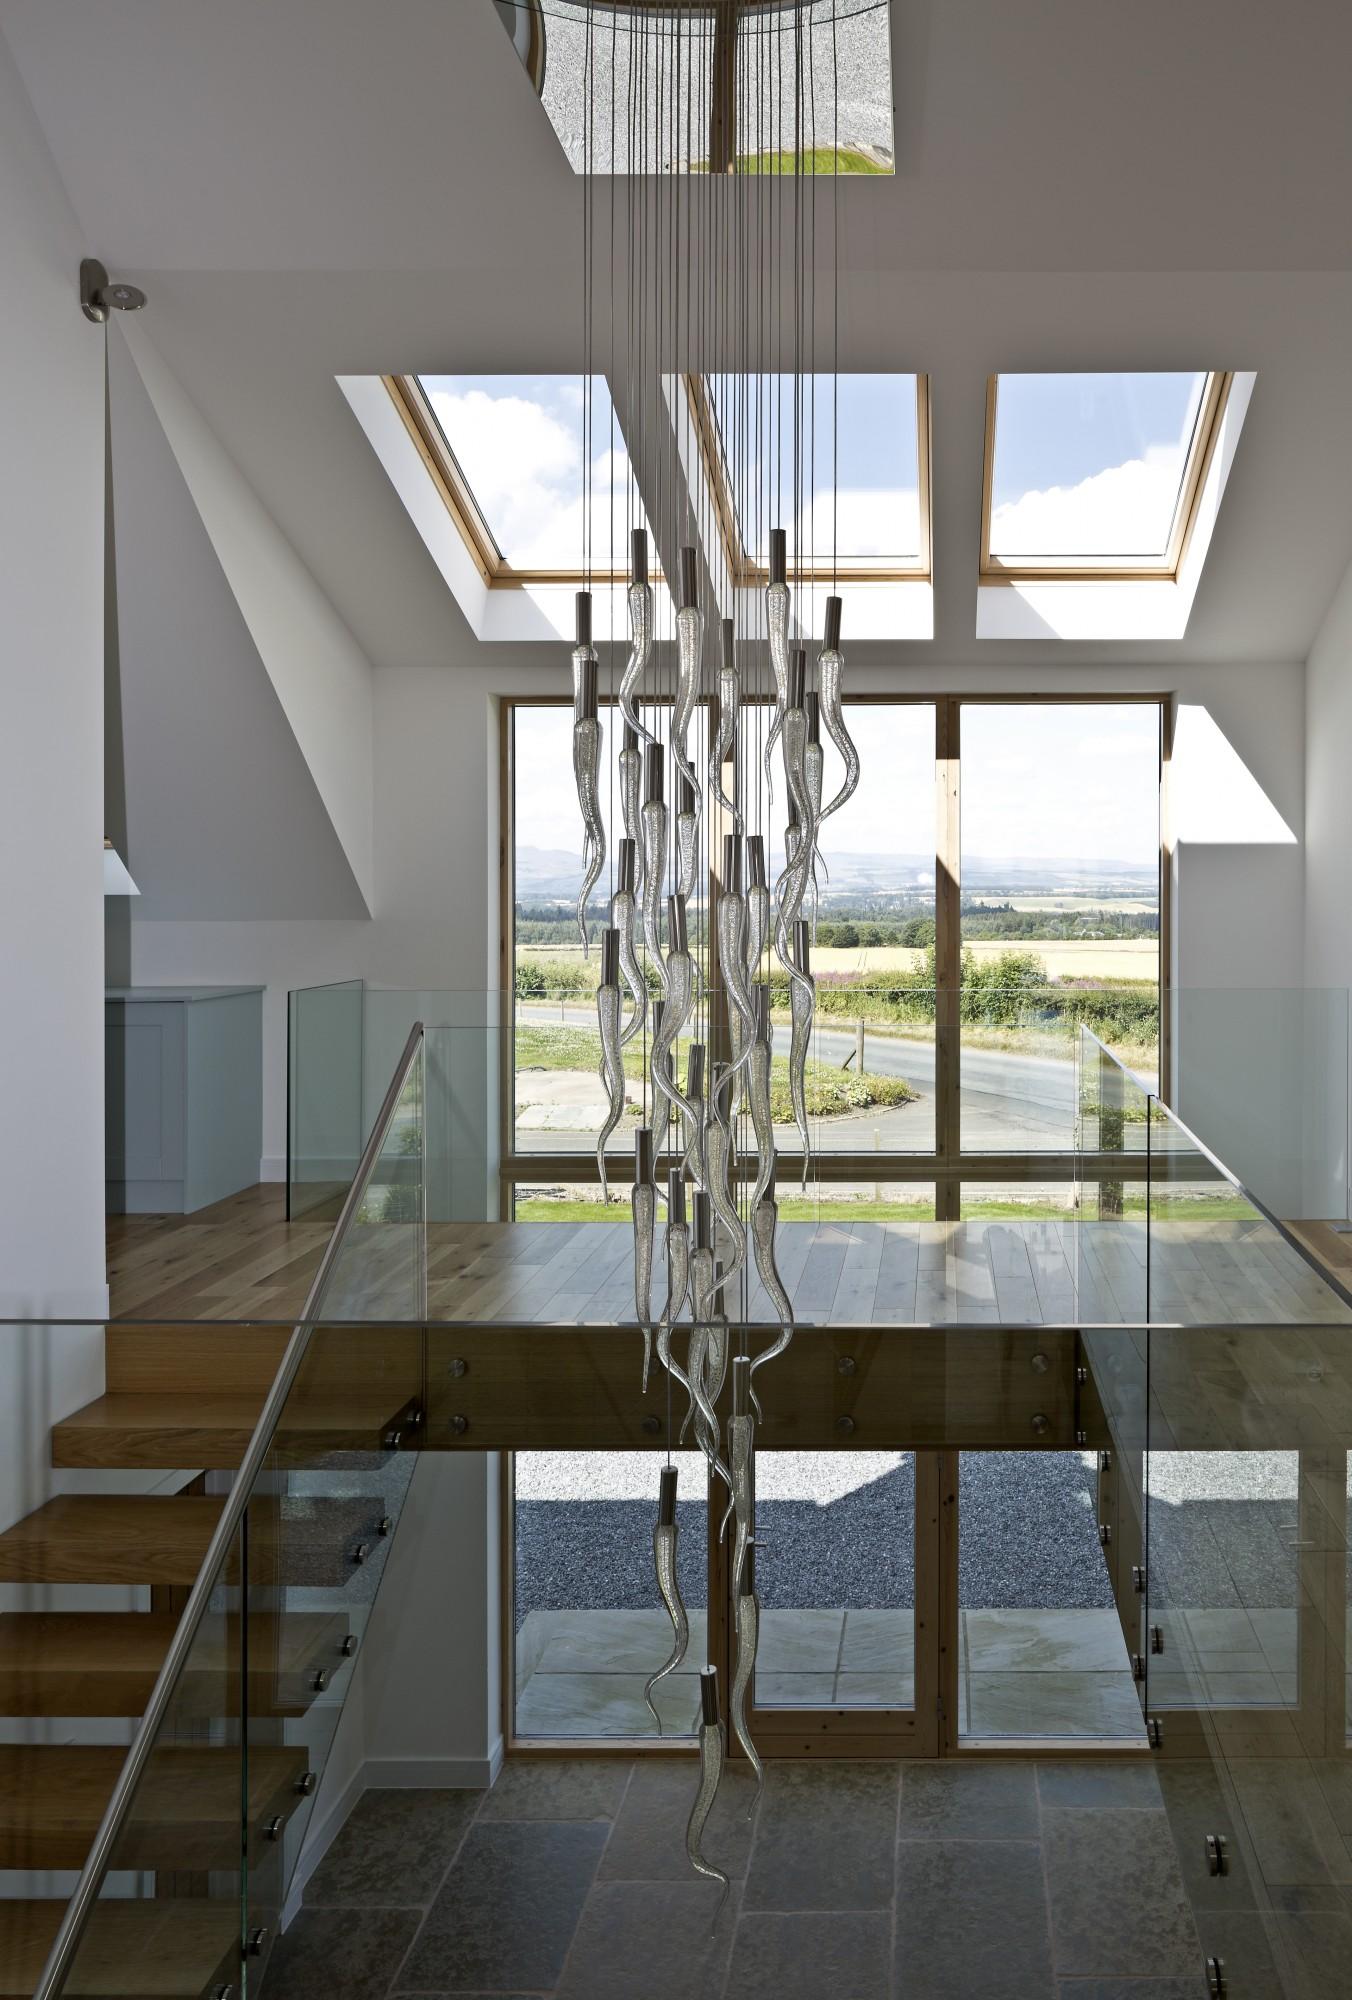 Atrium Space - Homebuilding & Renovating Magazine Featured Home